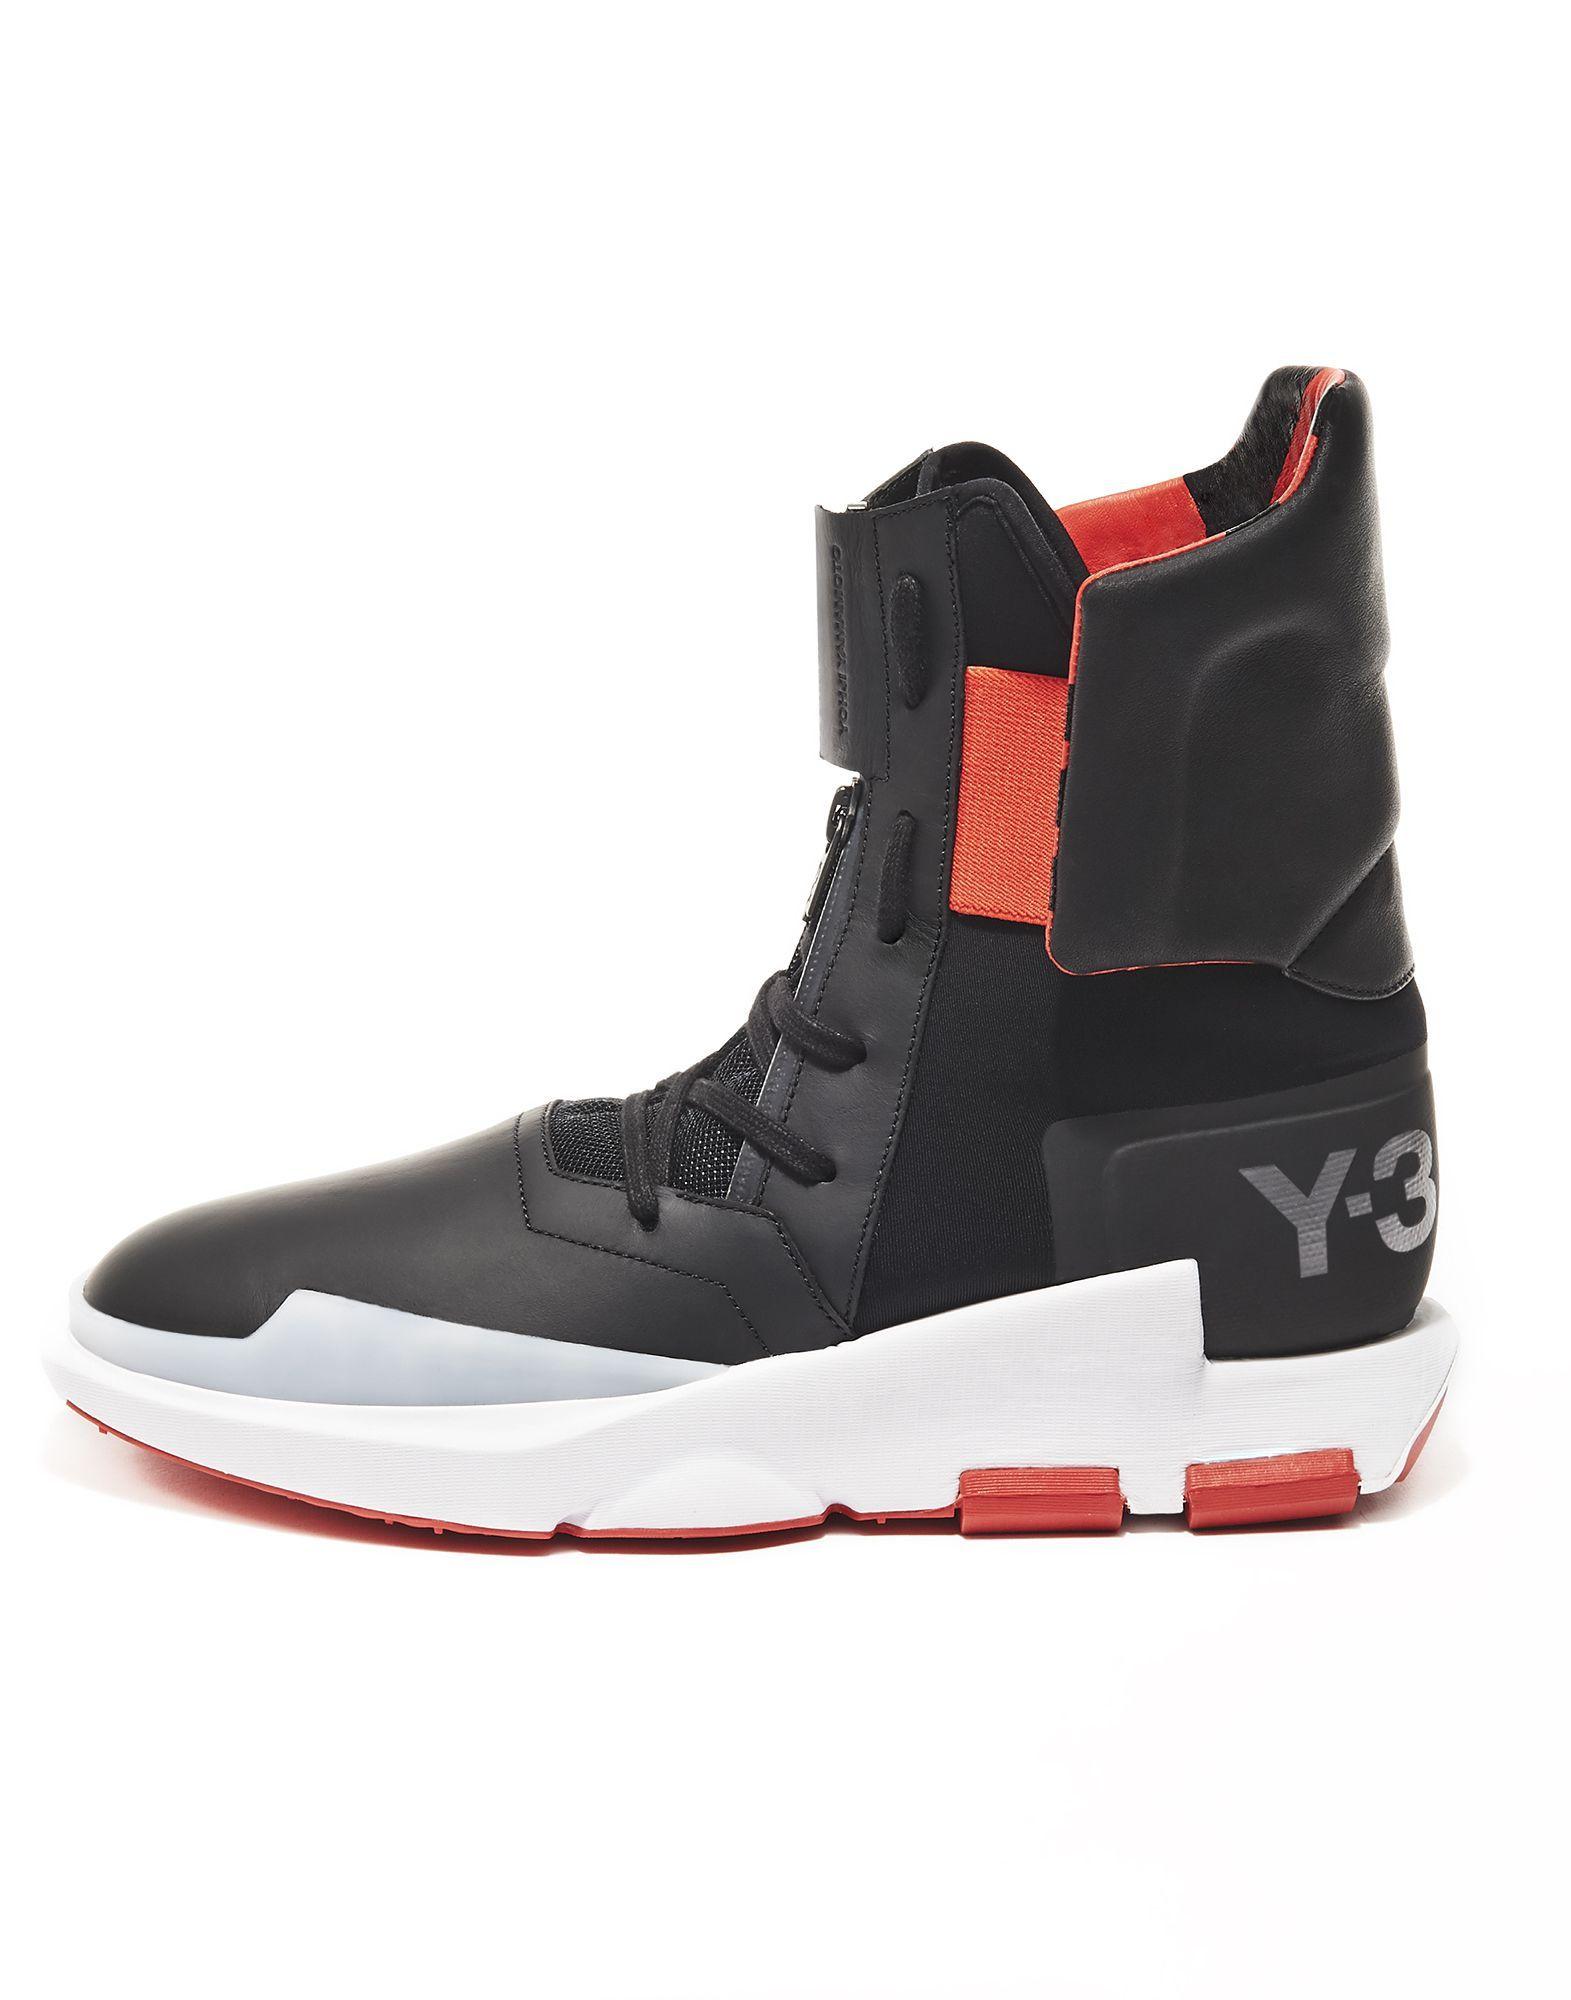 check out 80486 e0fc9 Adidas Y-3 NOCI 0003 Yohji Yammoto s latest style-driven creation (Men)